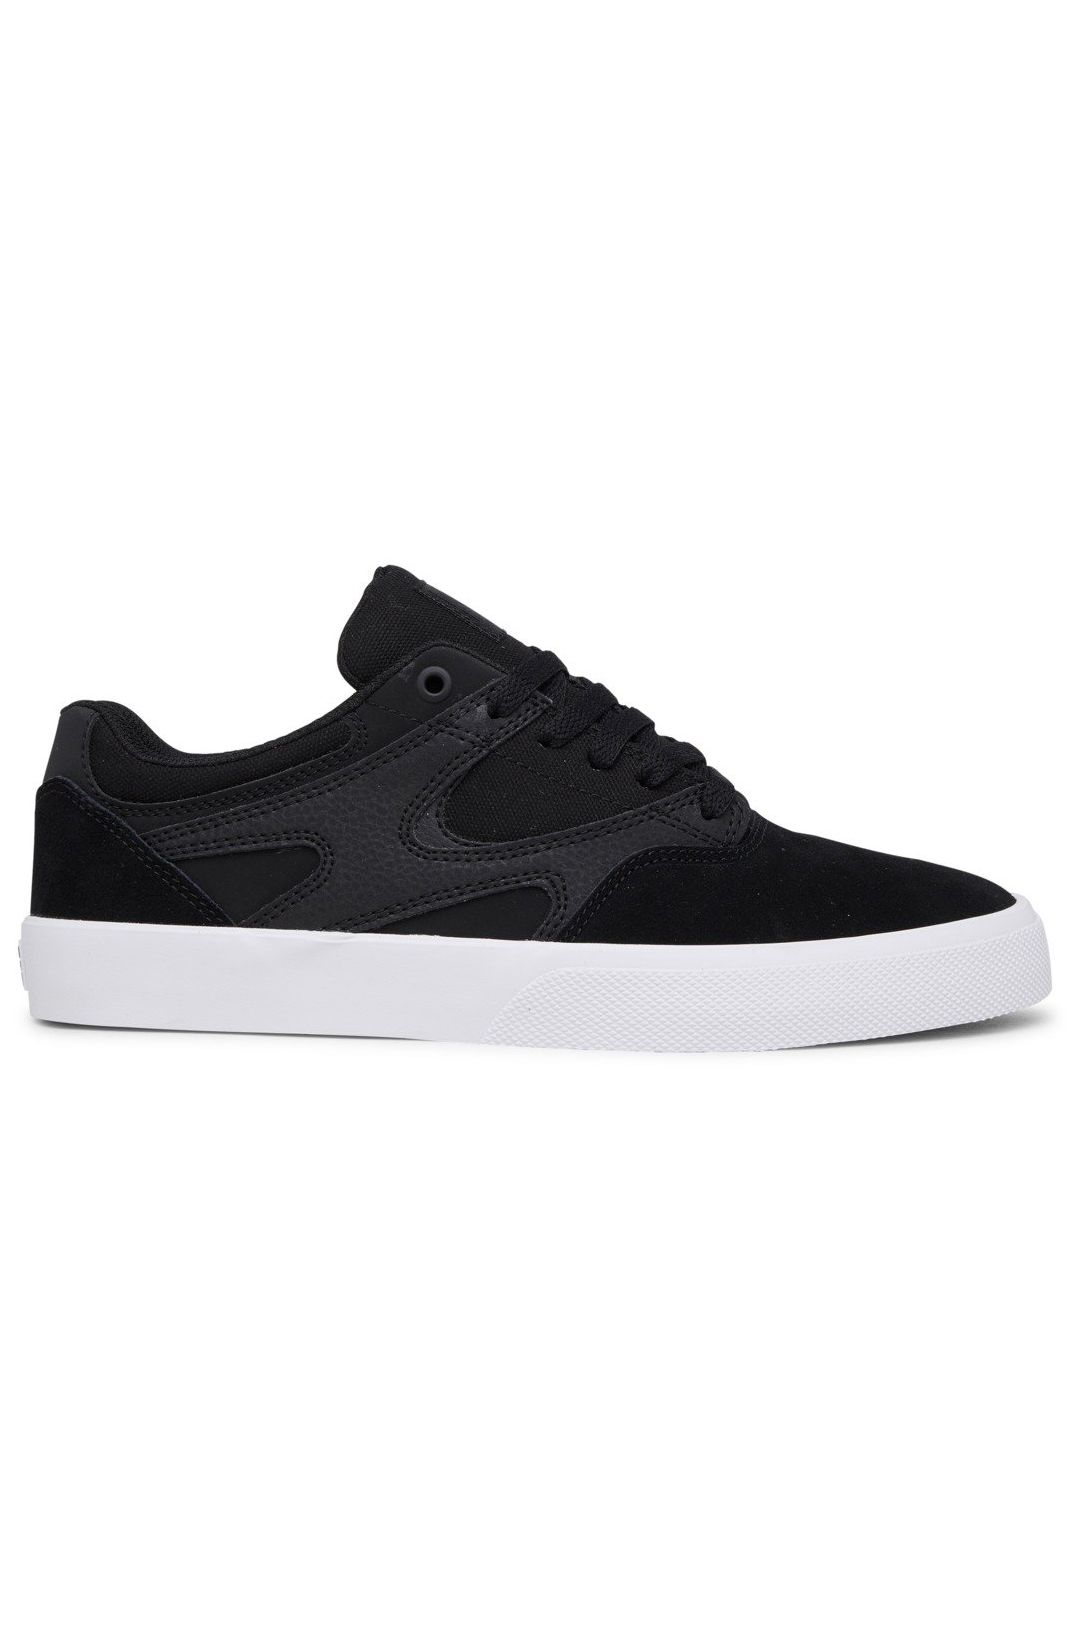 Tenis DC Shoes KALIS VULC S Black/Black/White